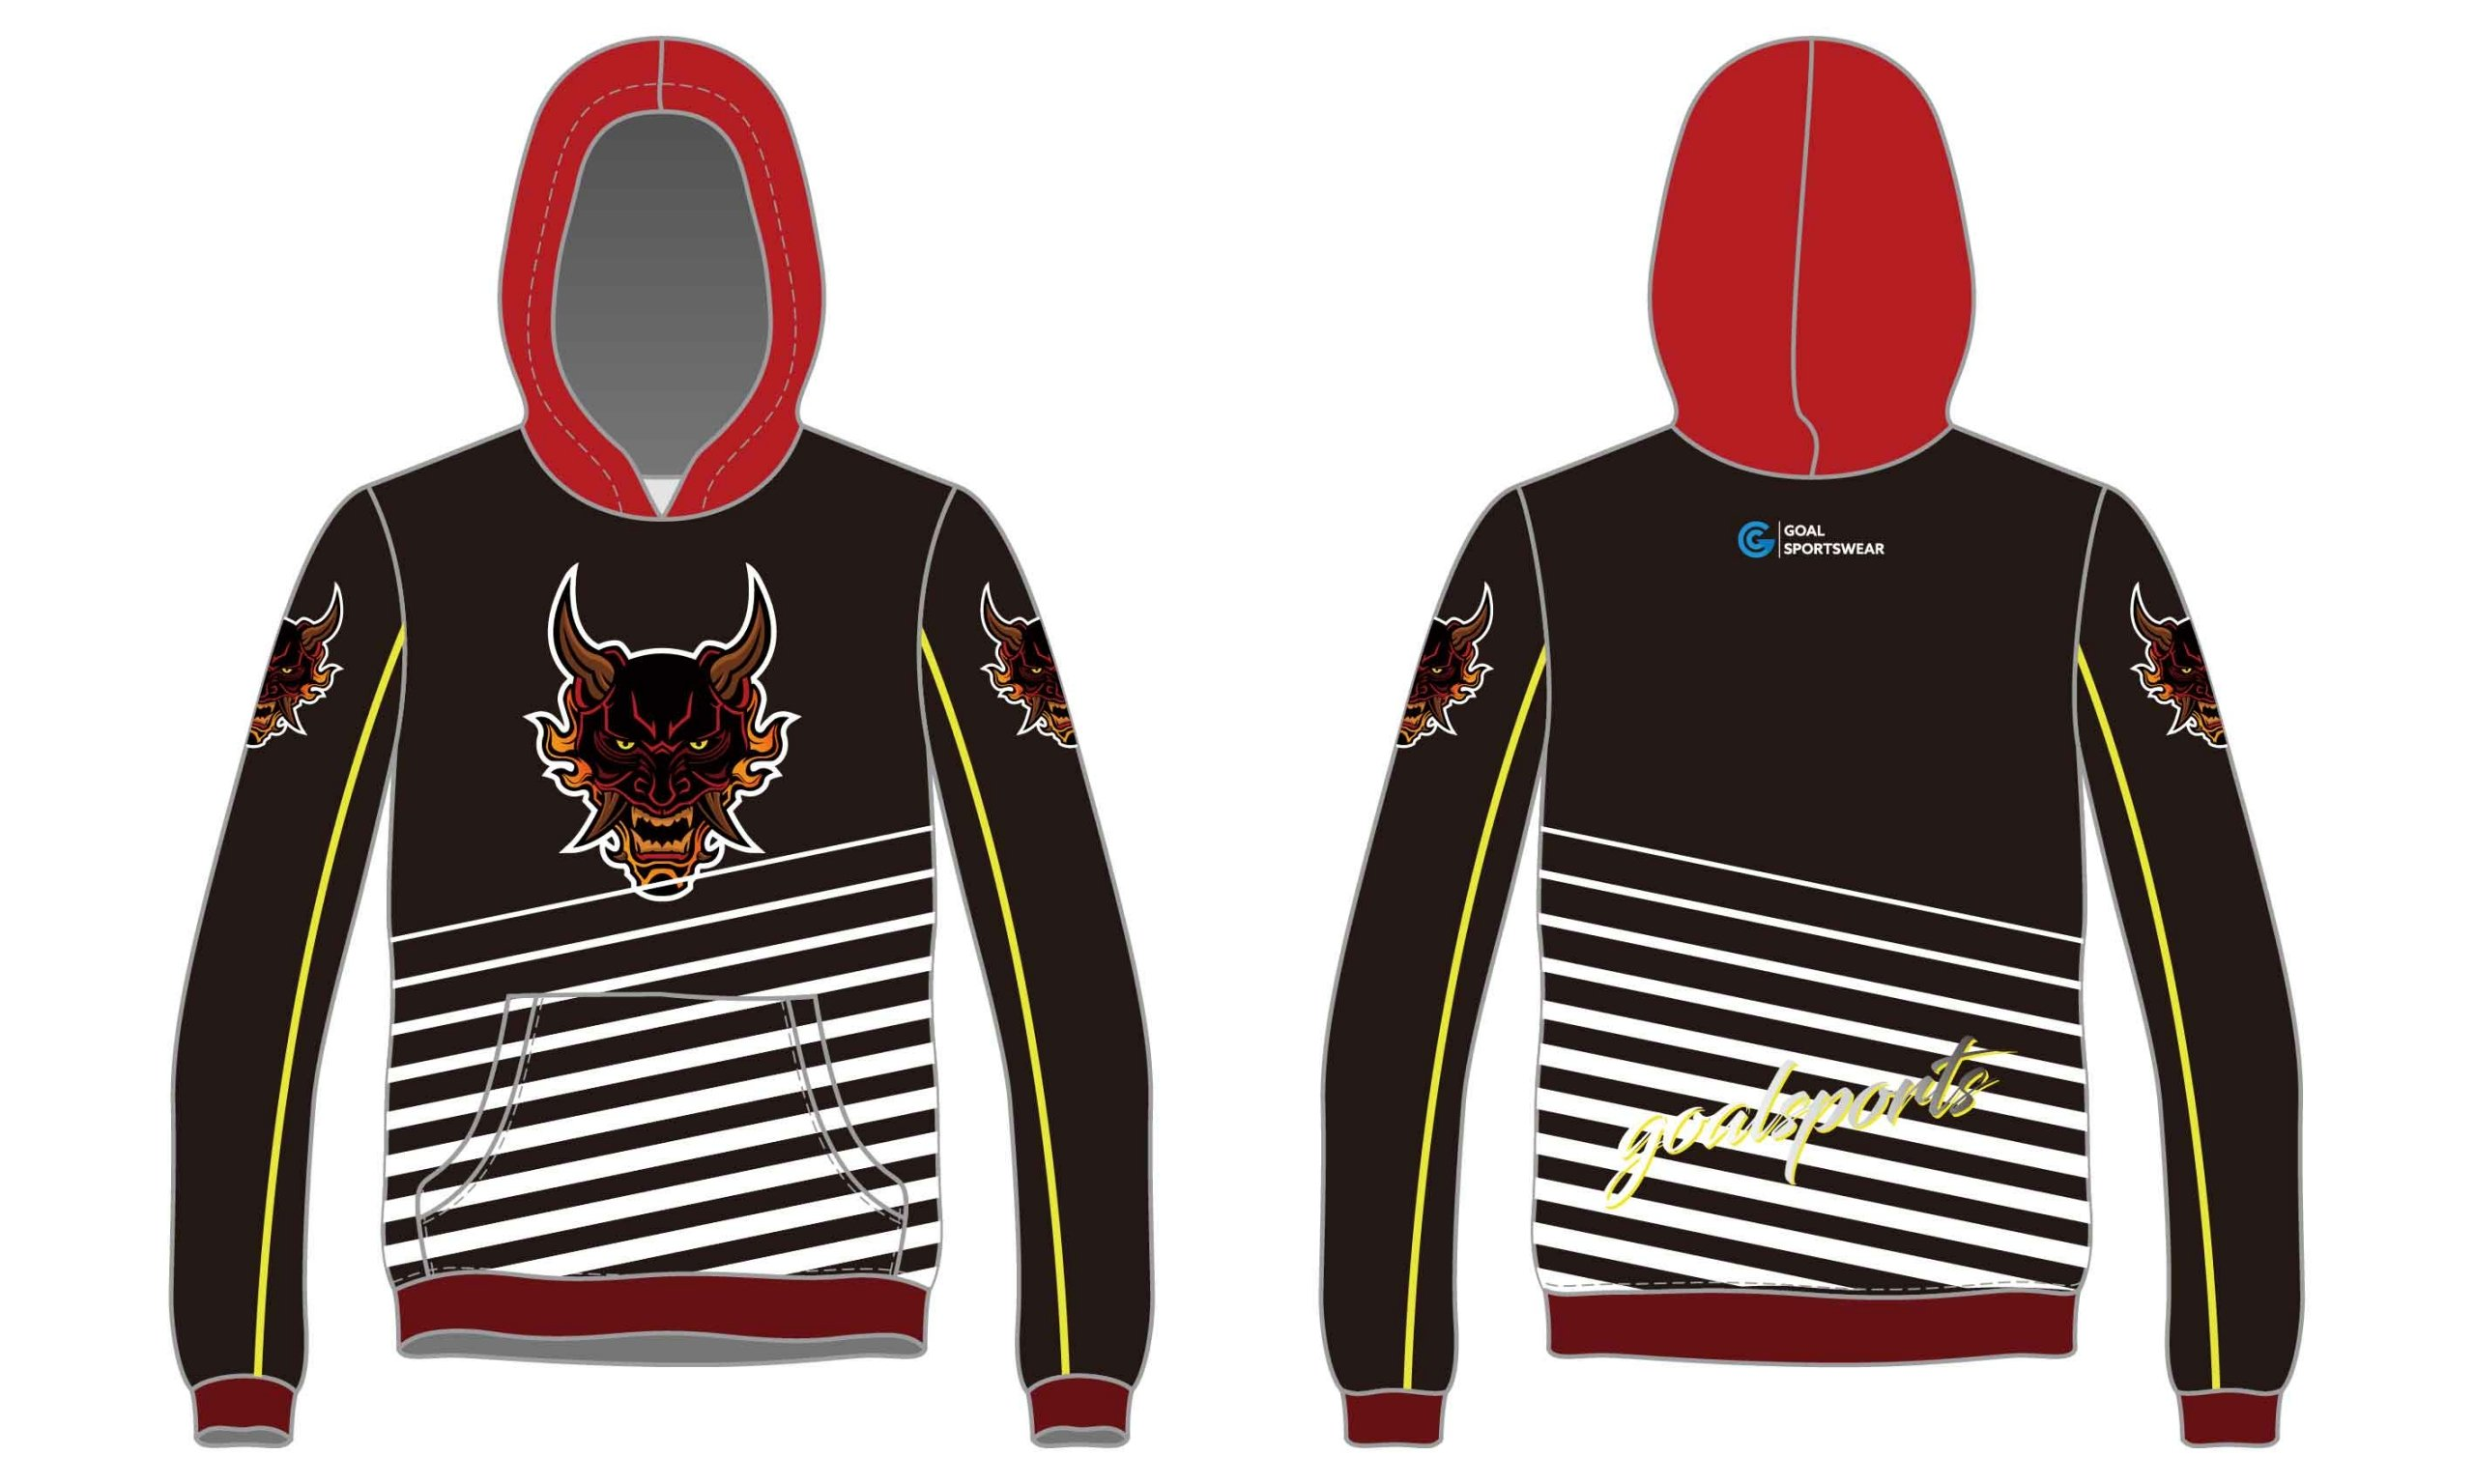 Custom wholesale sublimated printed wrestling sweatshirts